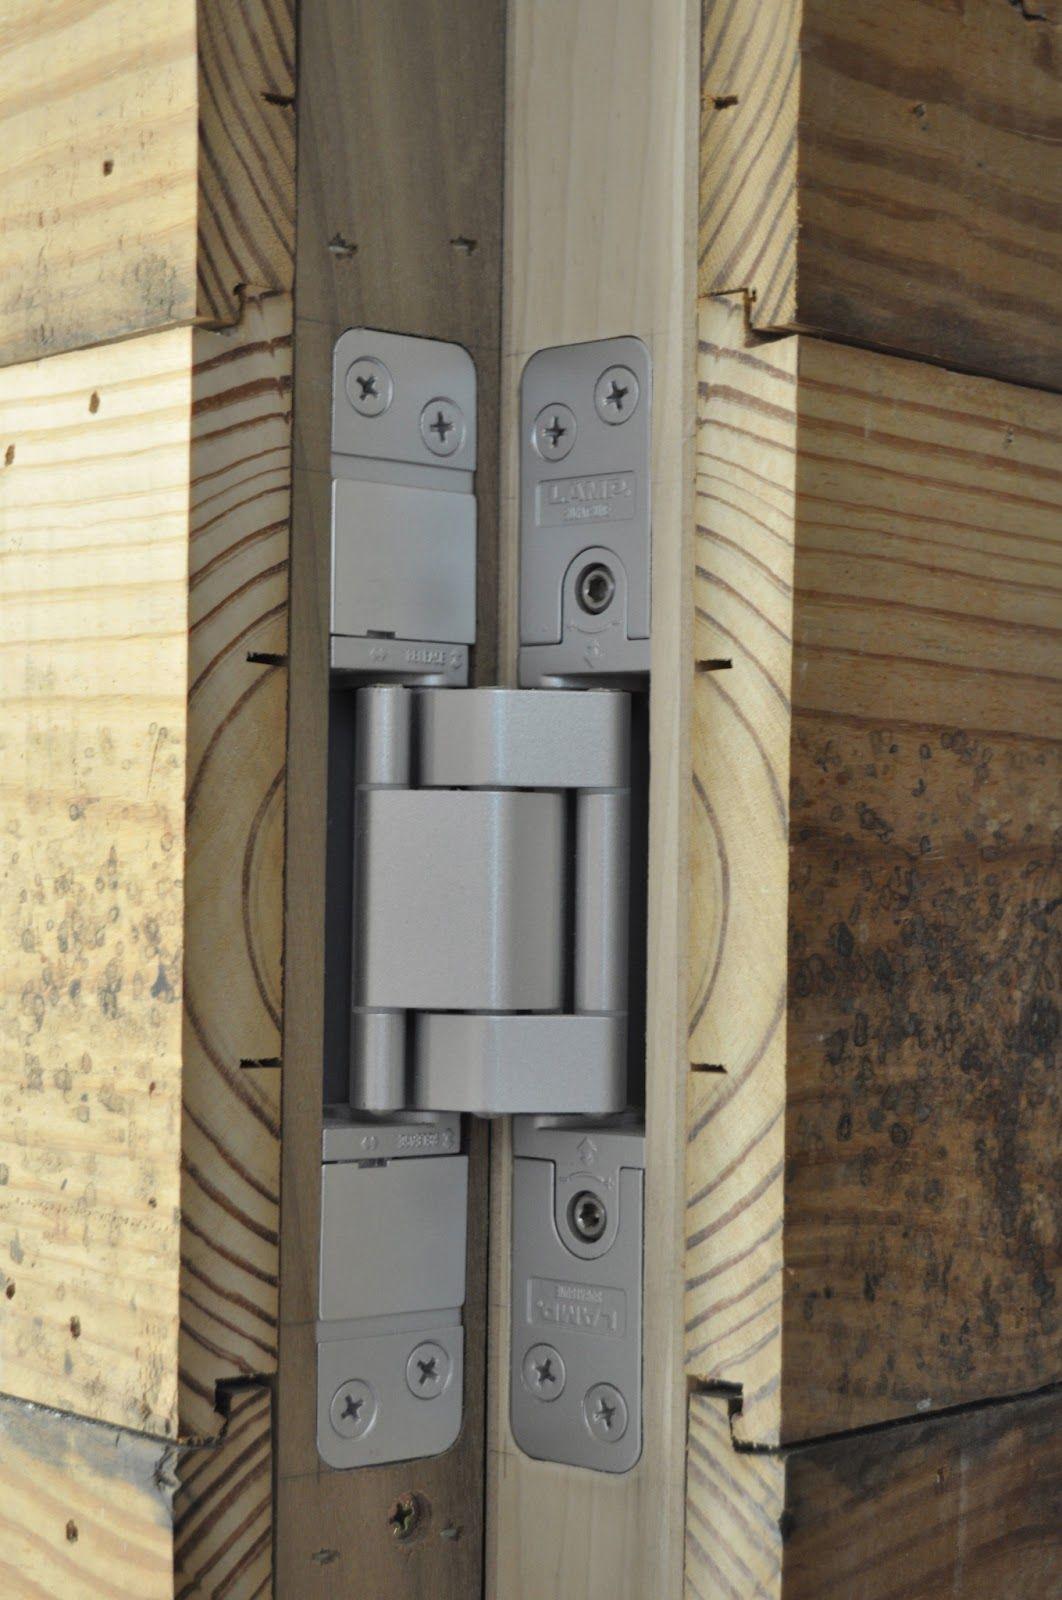 hidden doors, secret rooms, and the hardware that makes it